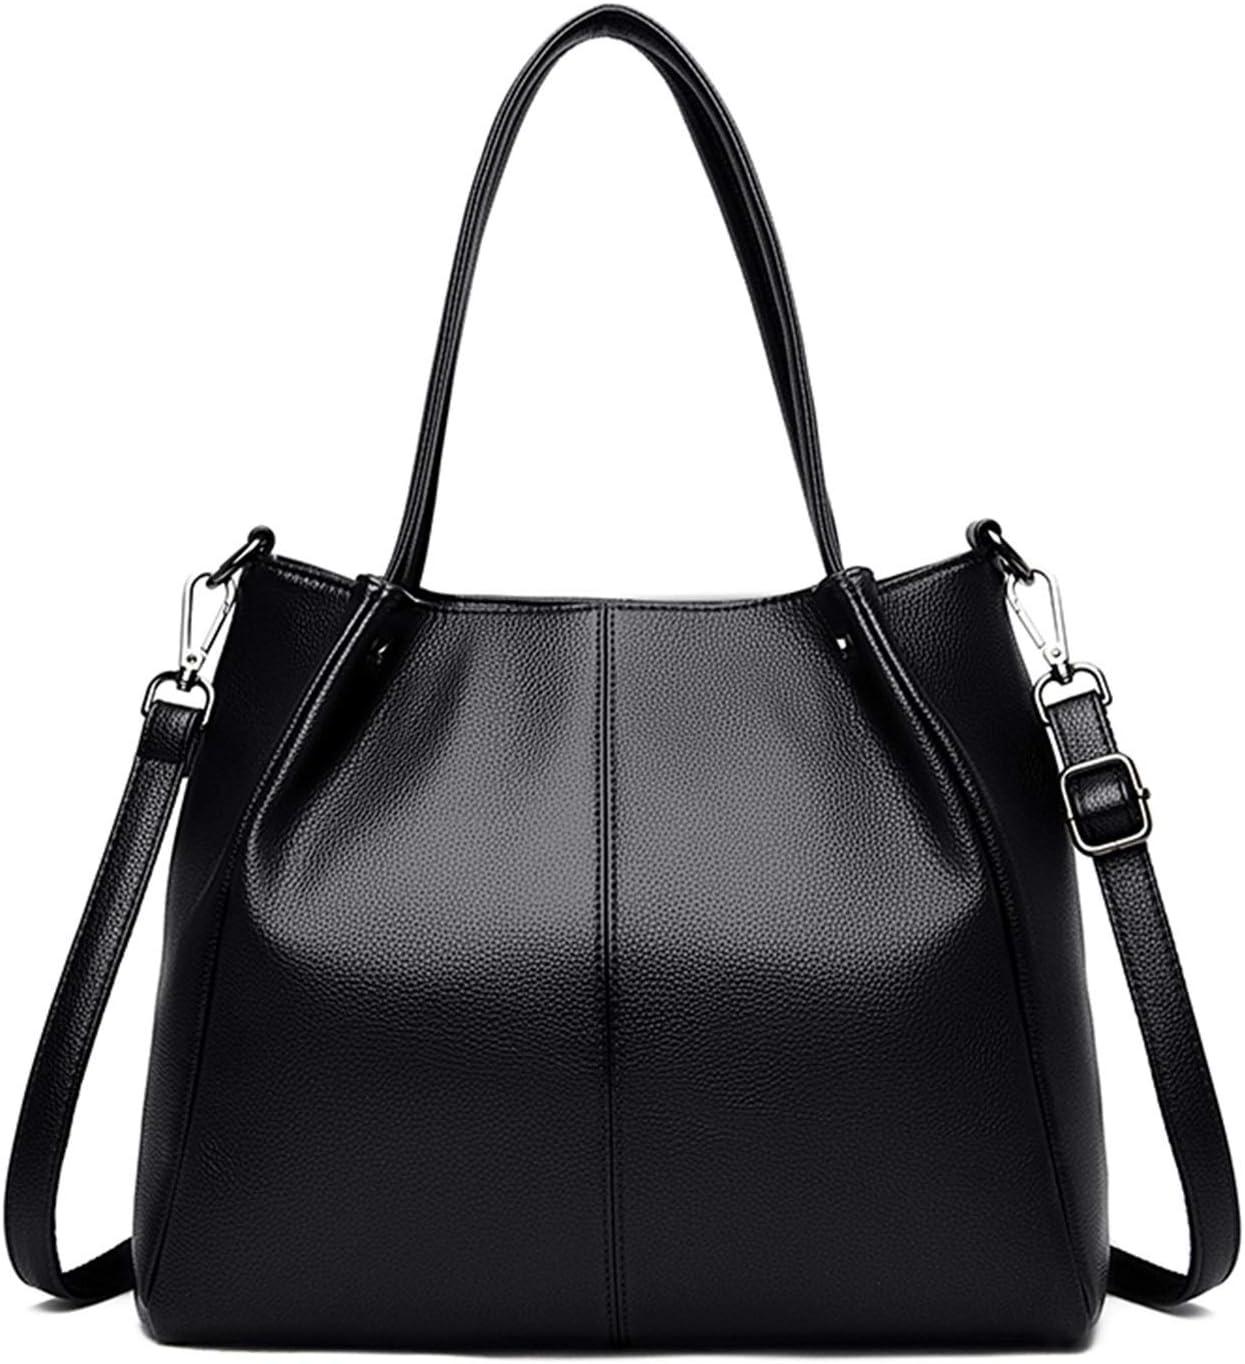 Women's Shoulder Bag Large Fashion Handbag Leat Capacity Max 44% Direct store OFF